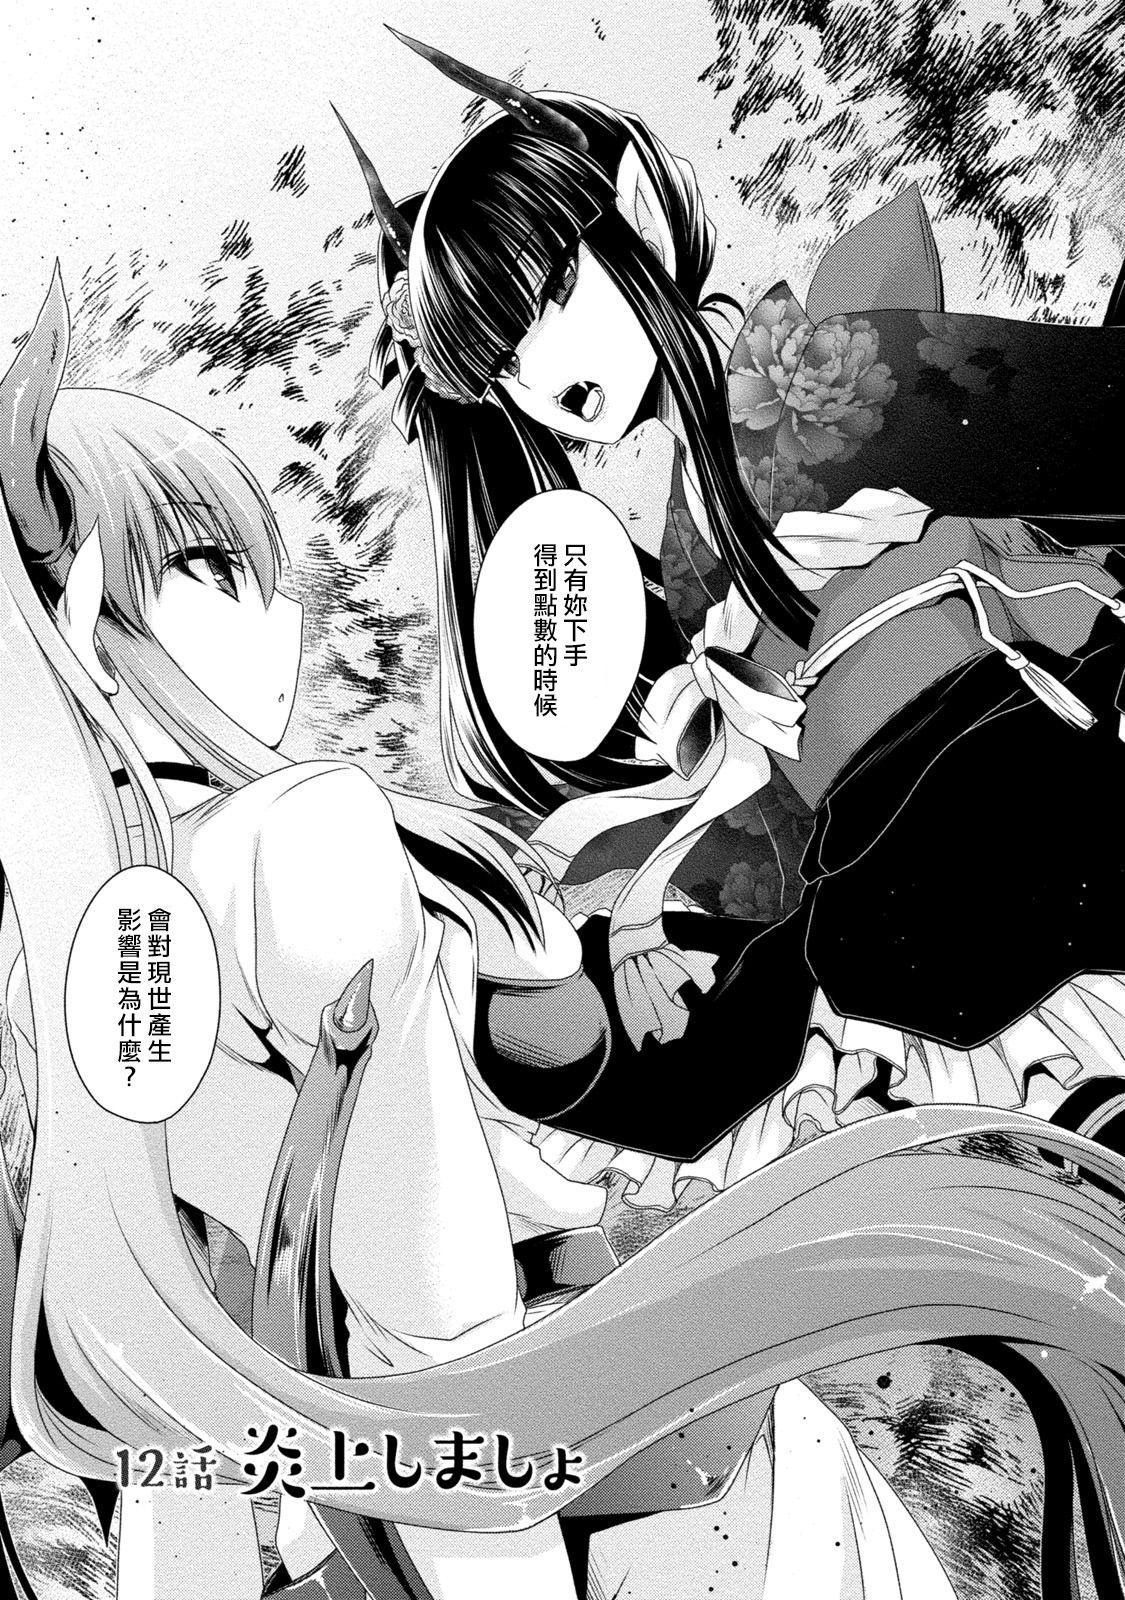 [Shinonome Ryu] Ore to Kanojo to Owaru Sekai - World's end LoveStory ch.10-13 [Chinese] [爱弹幕汉化组] [Digital] 48